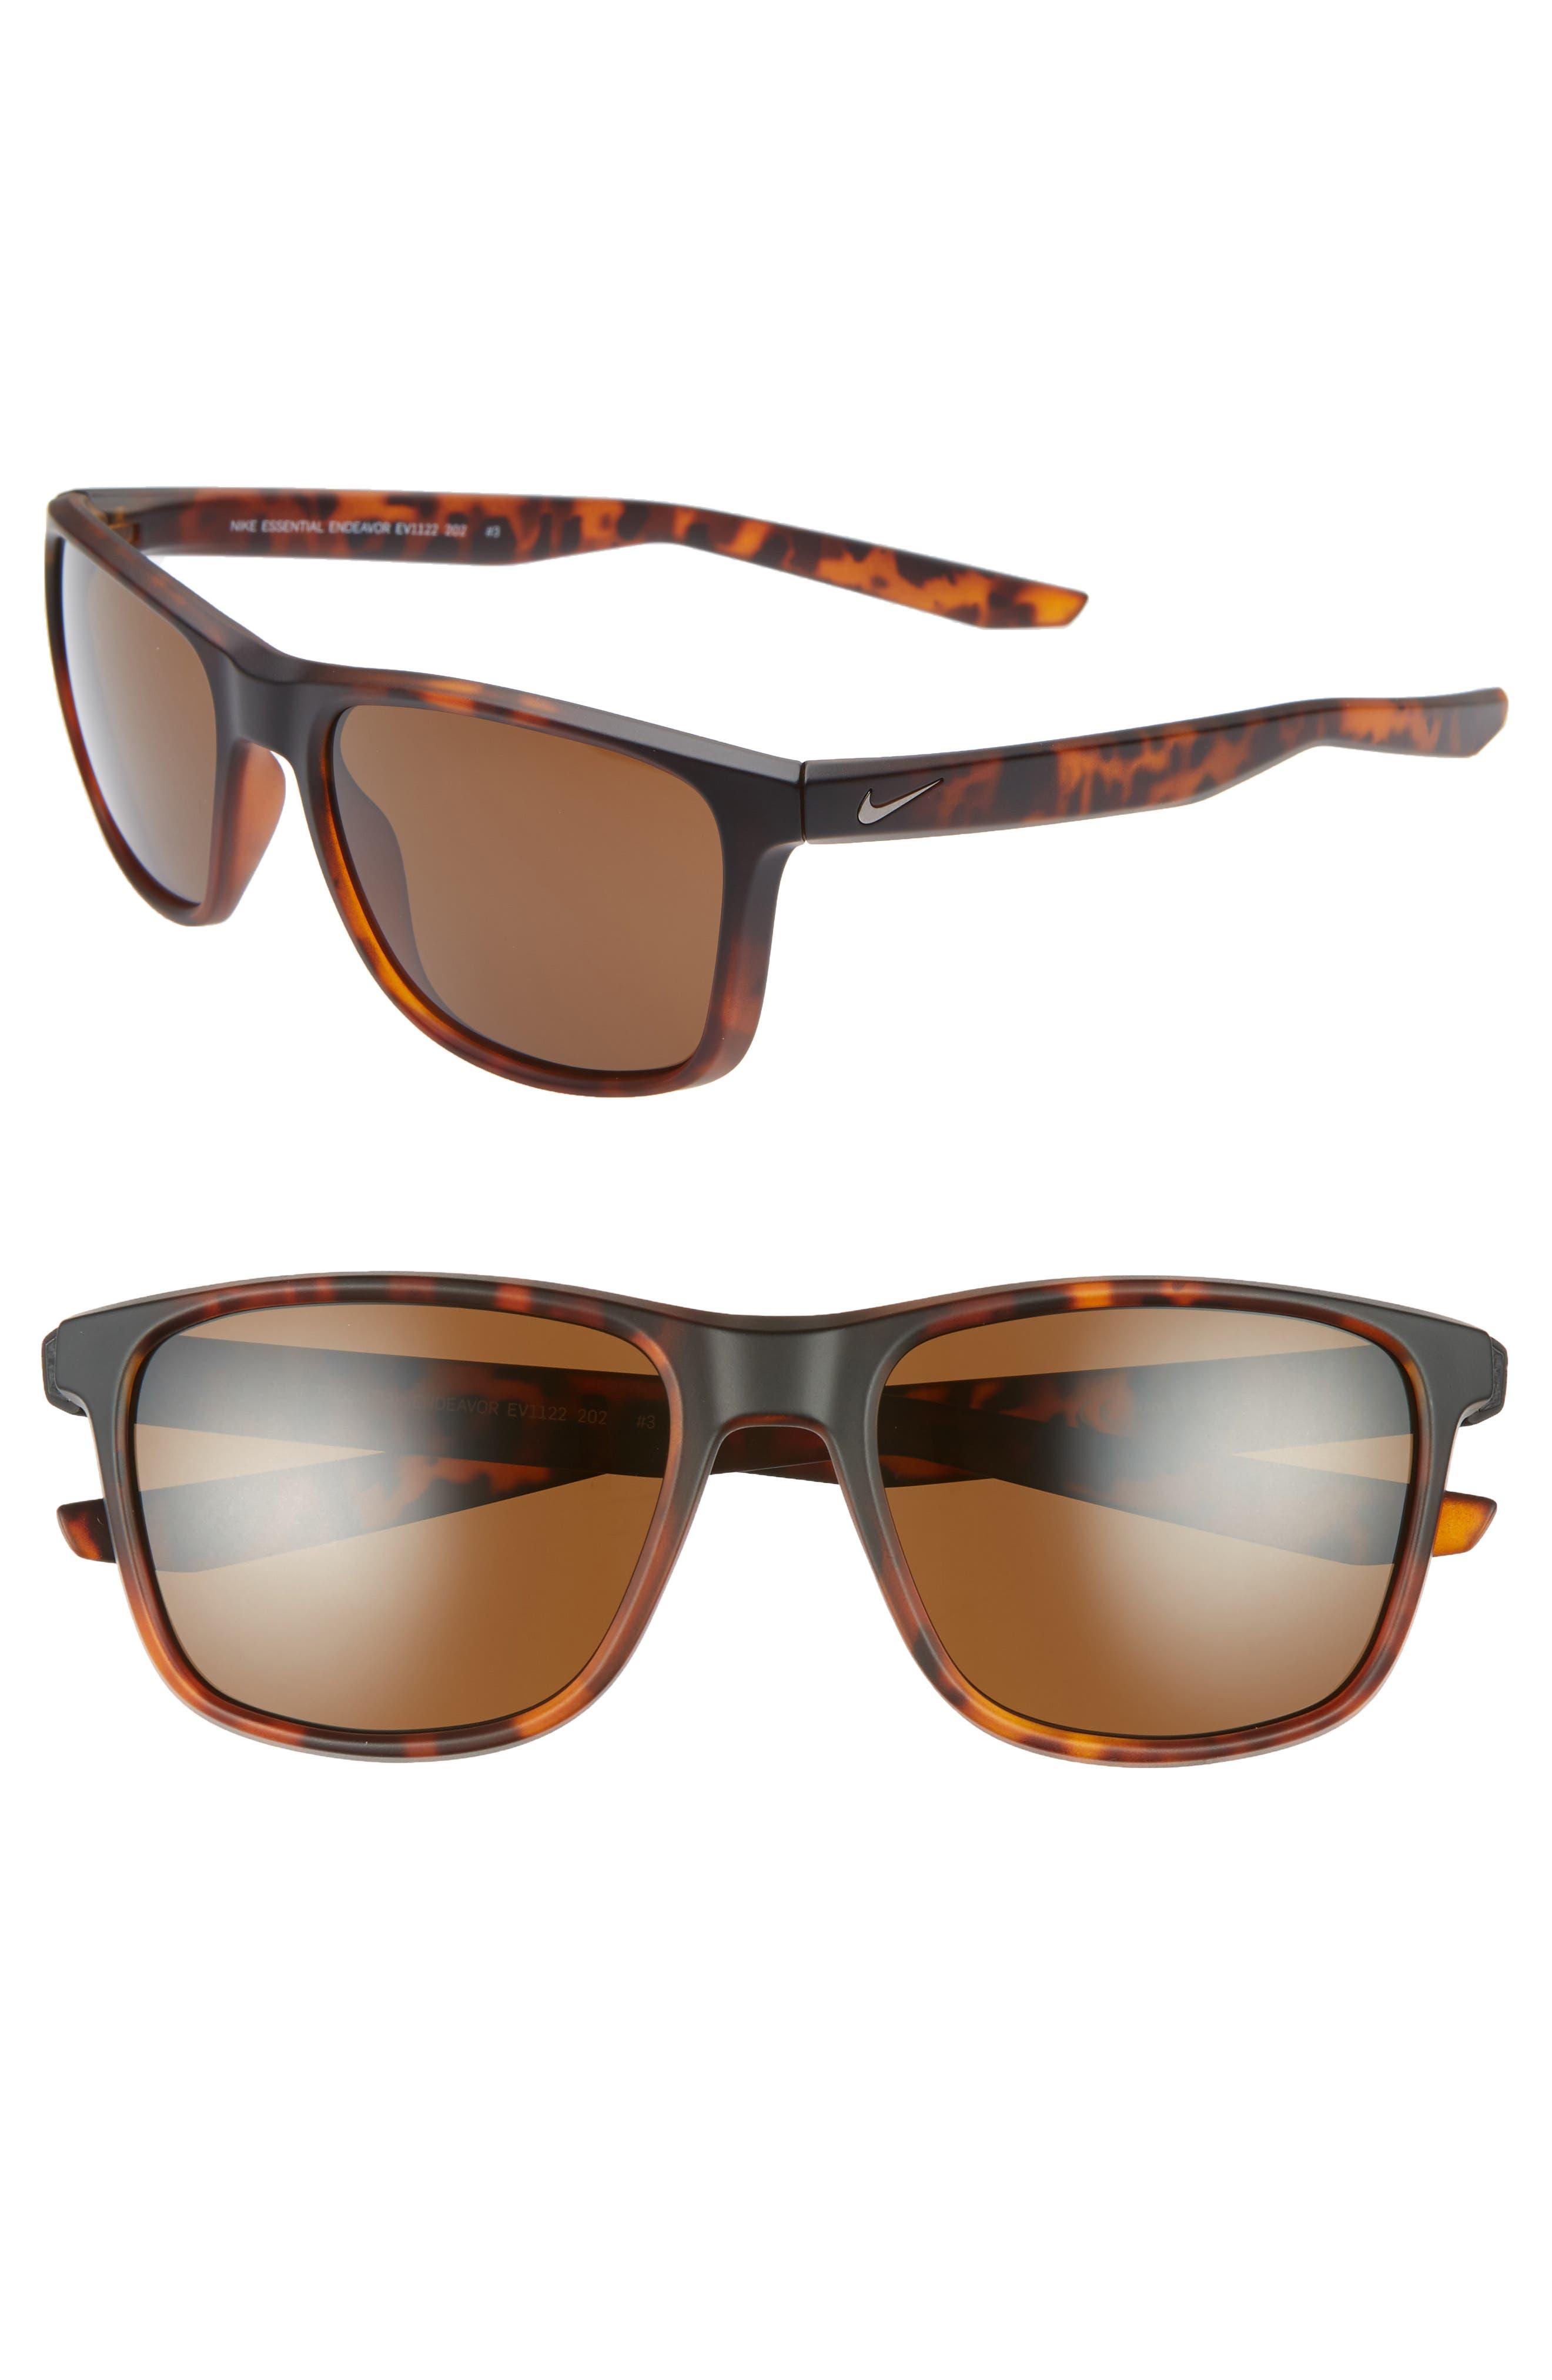 Nike Essential Endeavor 57Mm Square Sunglasses - Matte Tortoise/ Brown